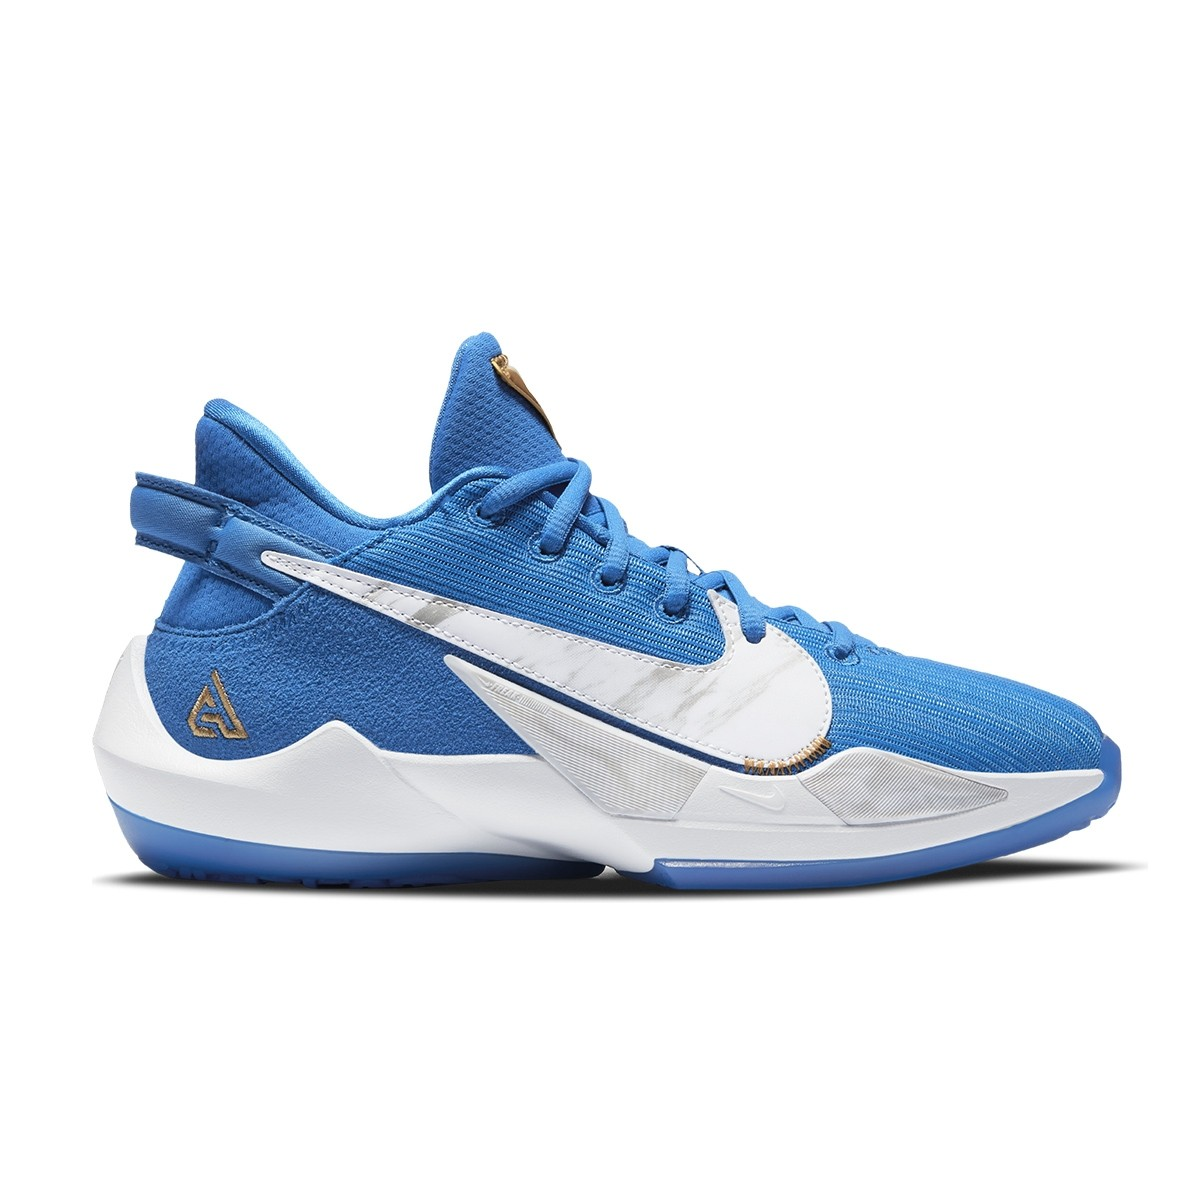 Nike Zoom Freak 2 Jr 'Signal Blue'